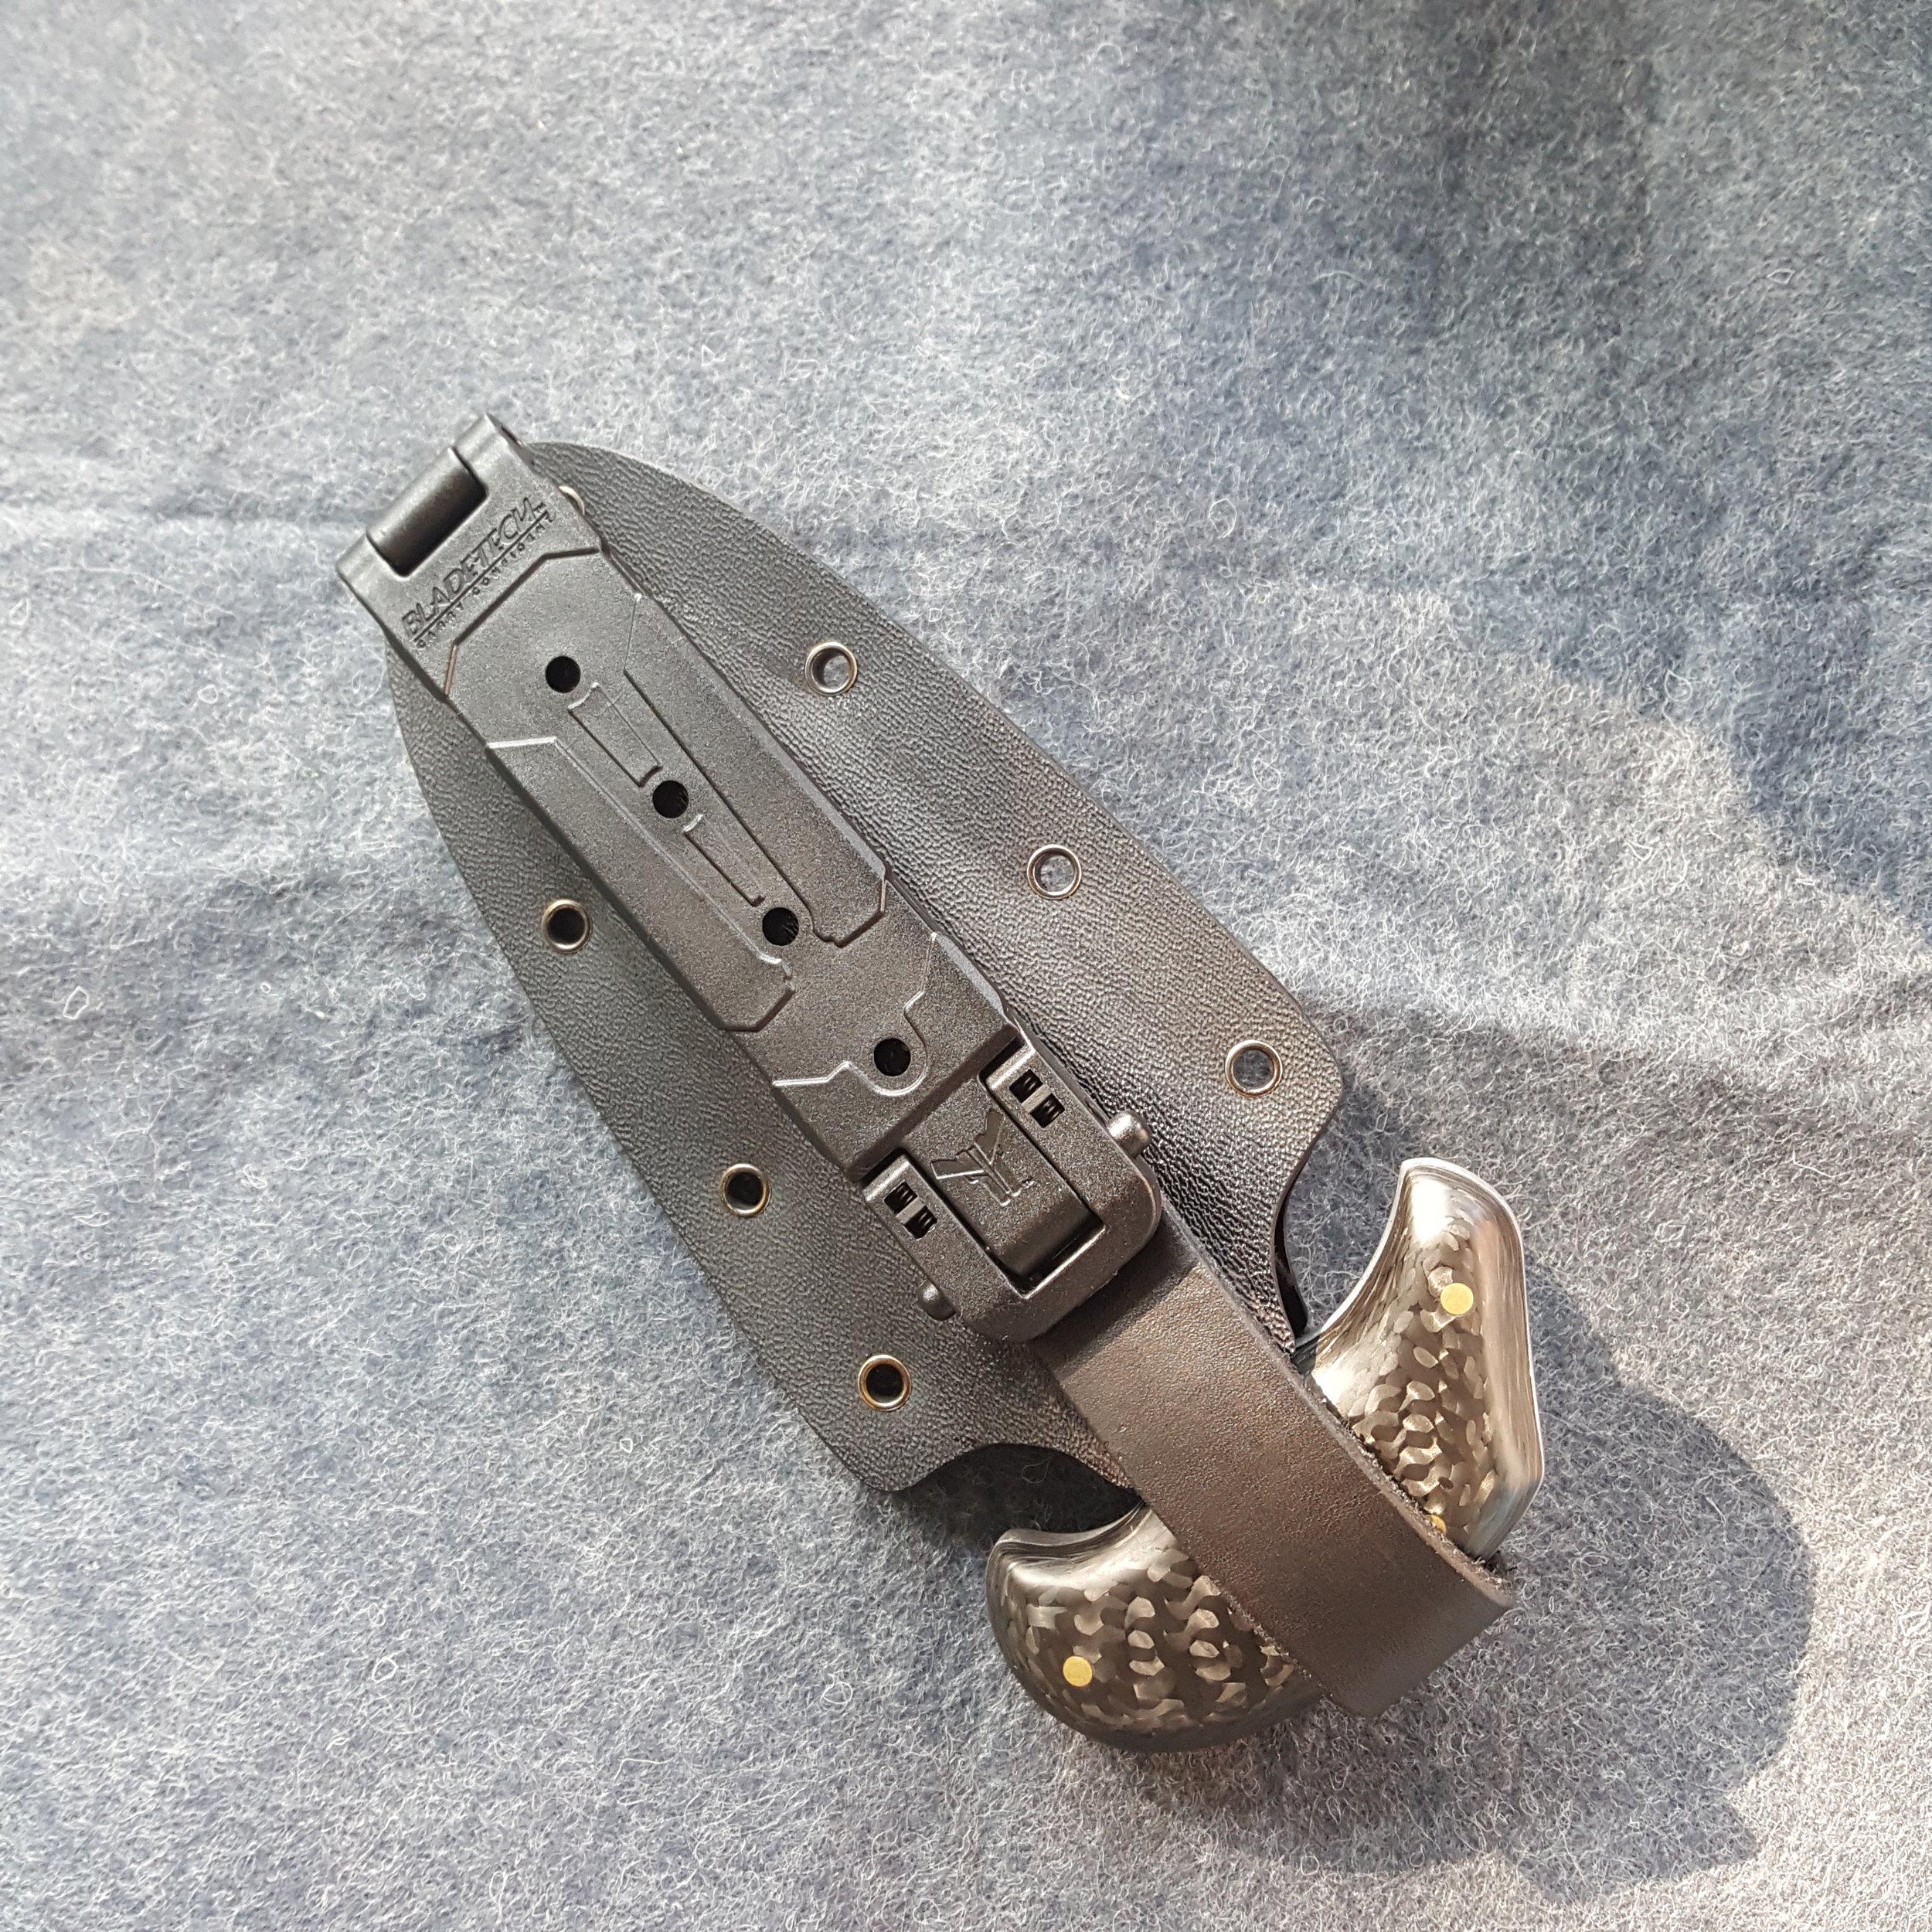 Hand-forged pattern welded steel push dagger, with carbon fiber handle.  -  Derick Kemper dameslflyforge.com.jpg